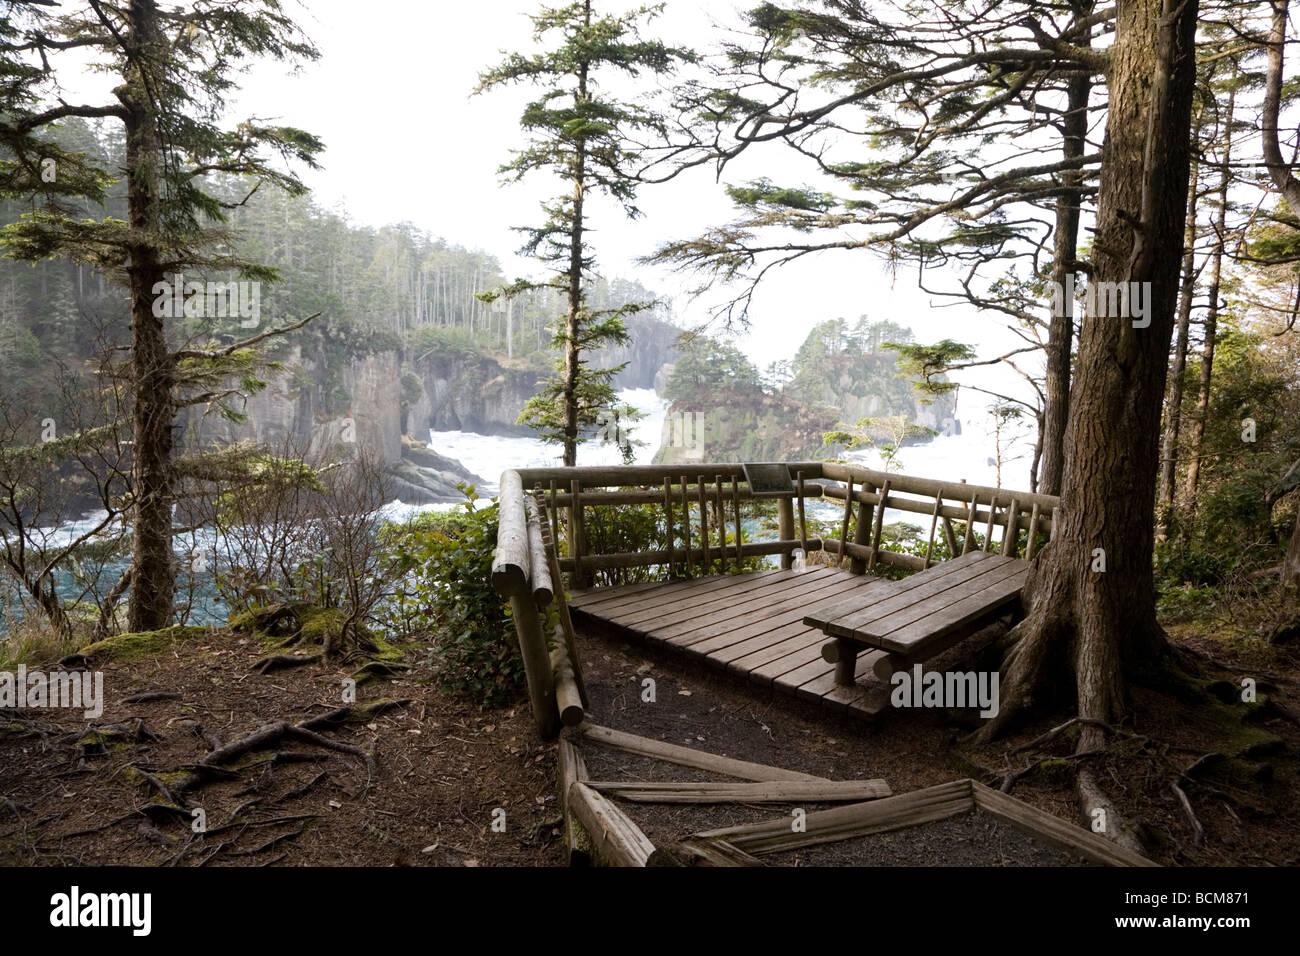 Overlook on the Cape Flattery Trail Olympic Coast National Marine Sanctuary Washington State - Stock Image